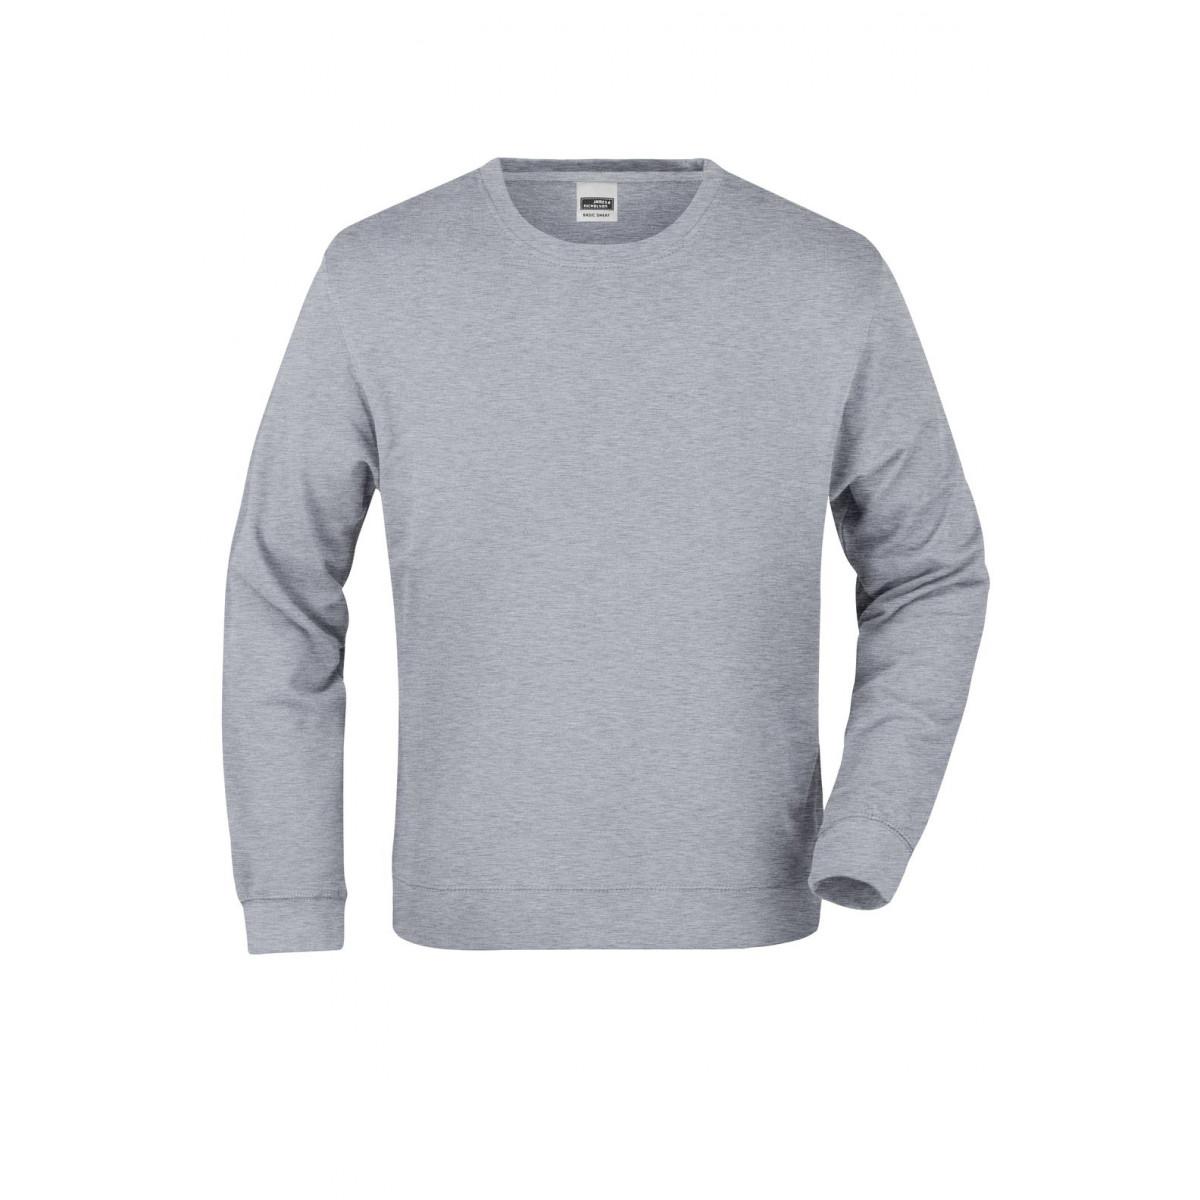 Толстовка мужская JN057 Basic Sweat - Серый меланж